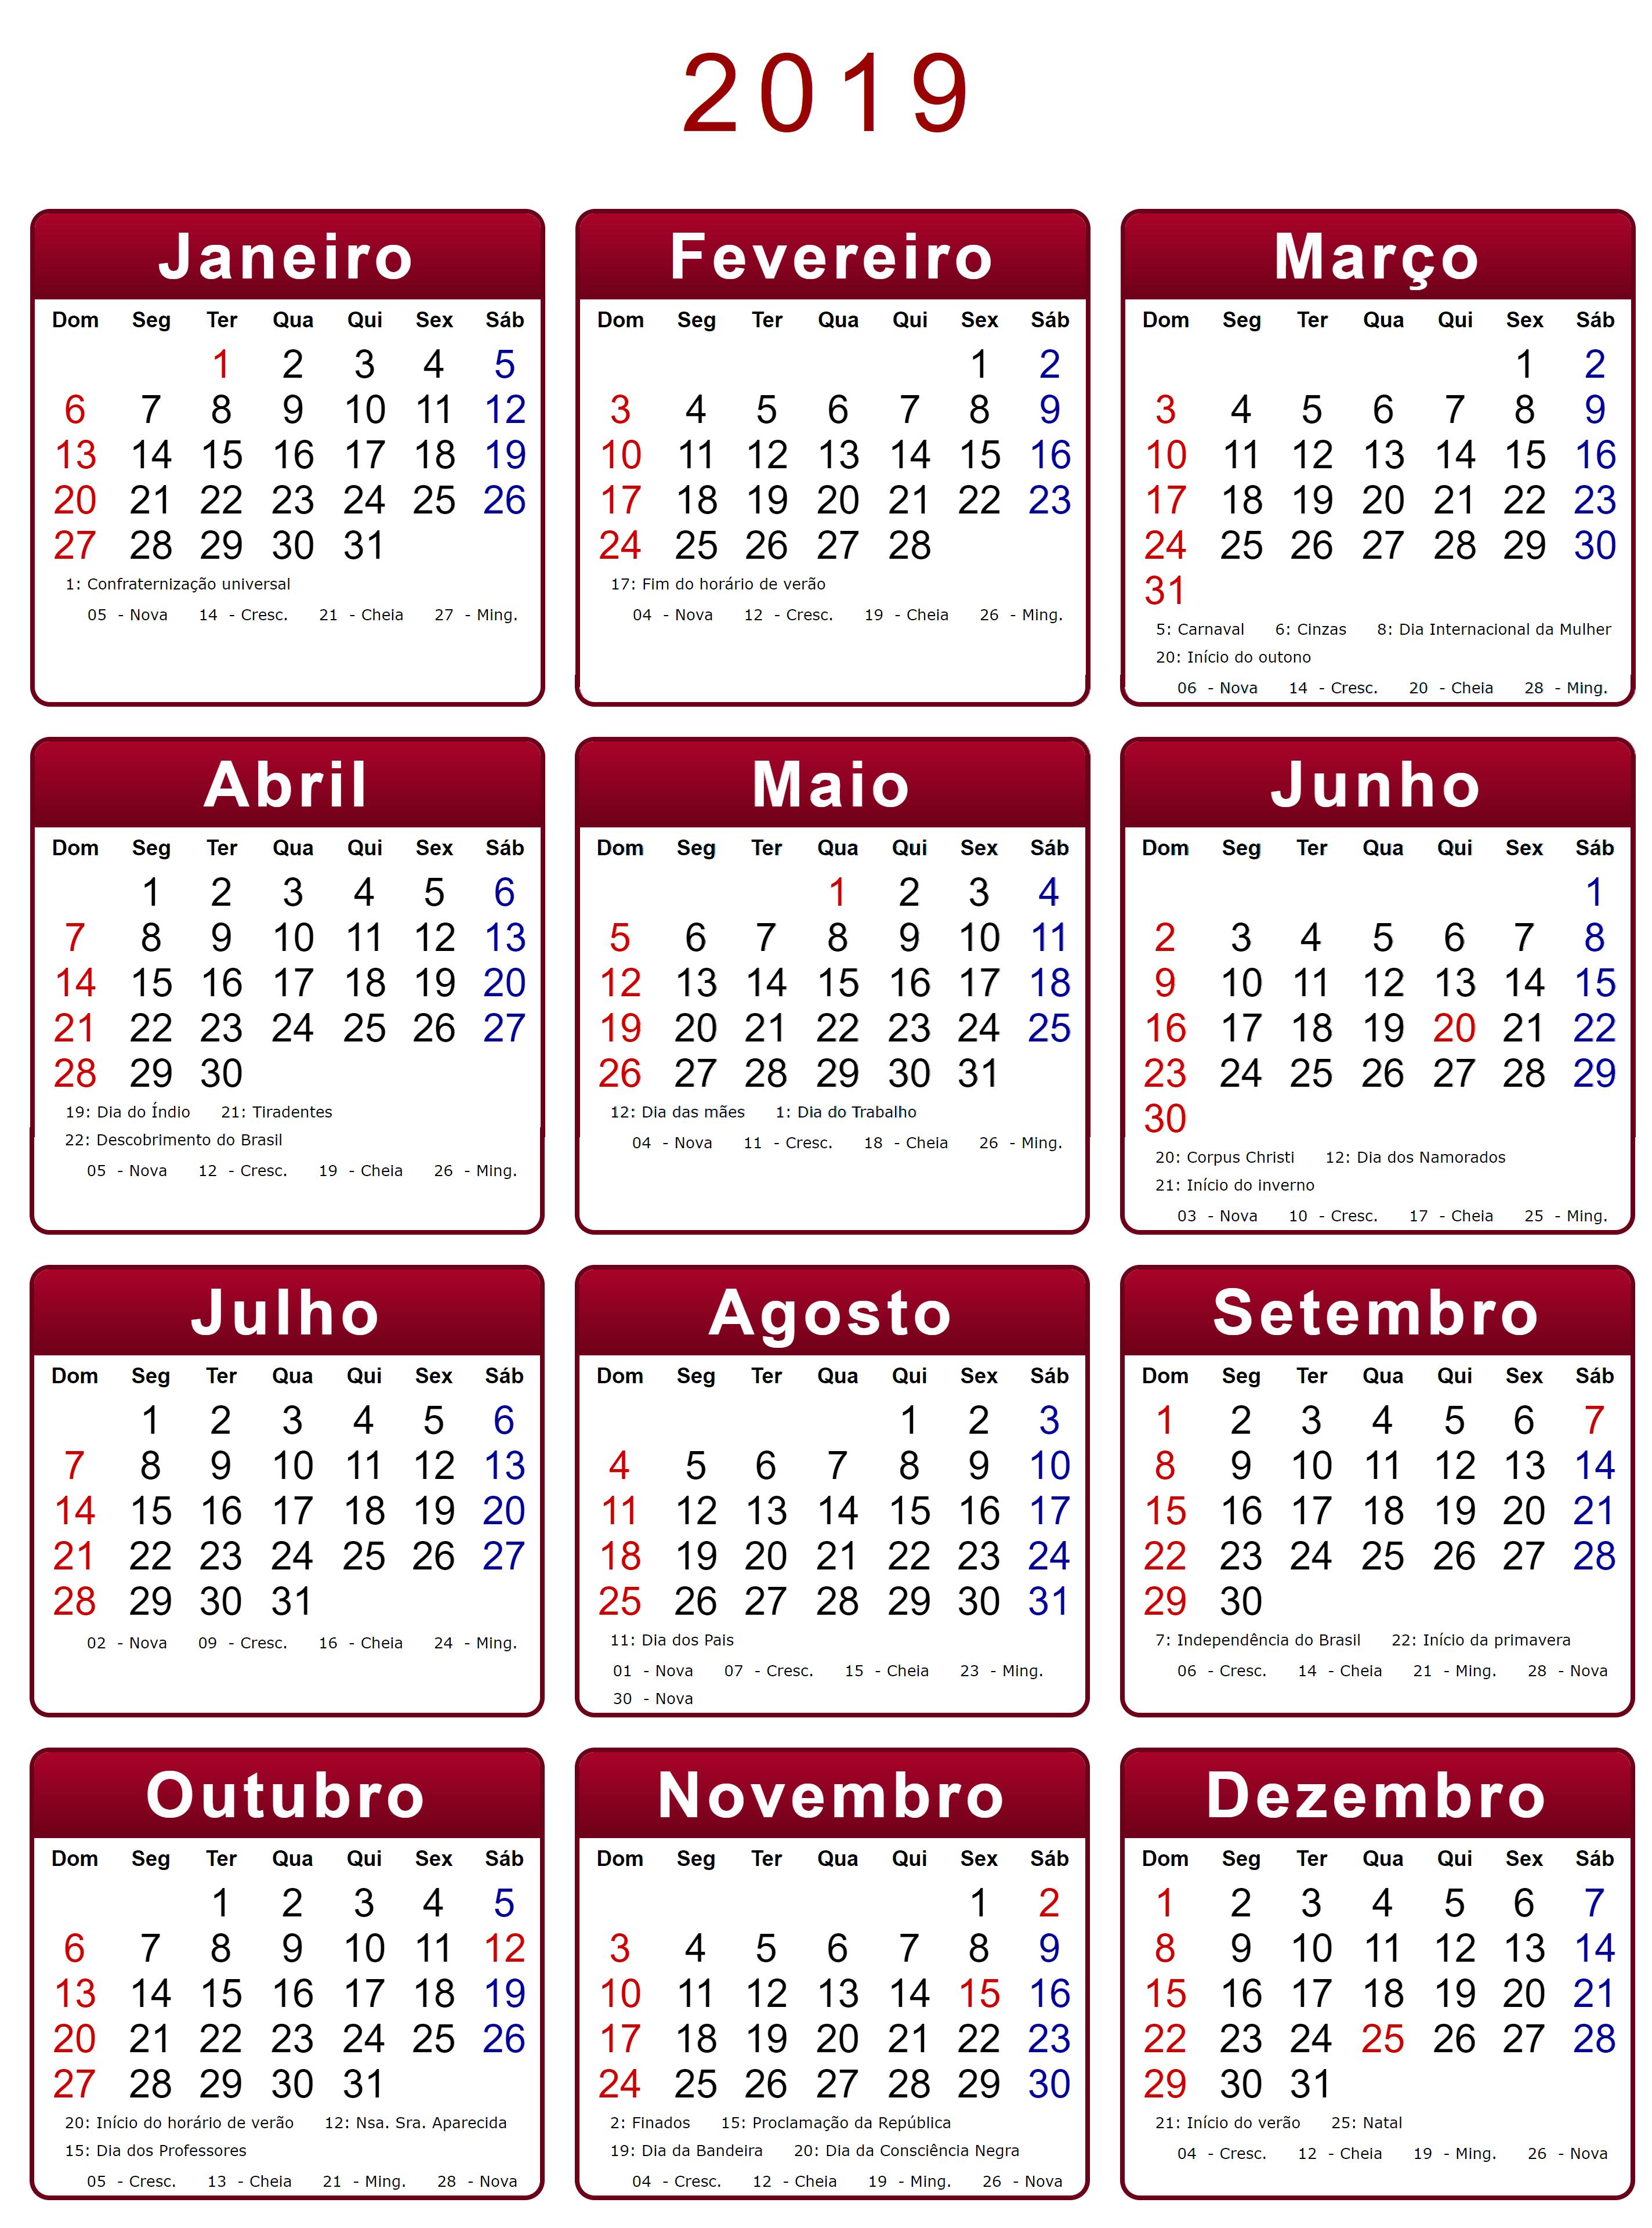 gratis astrologi 2019